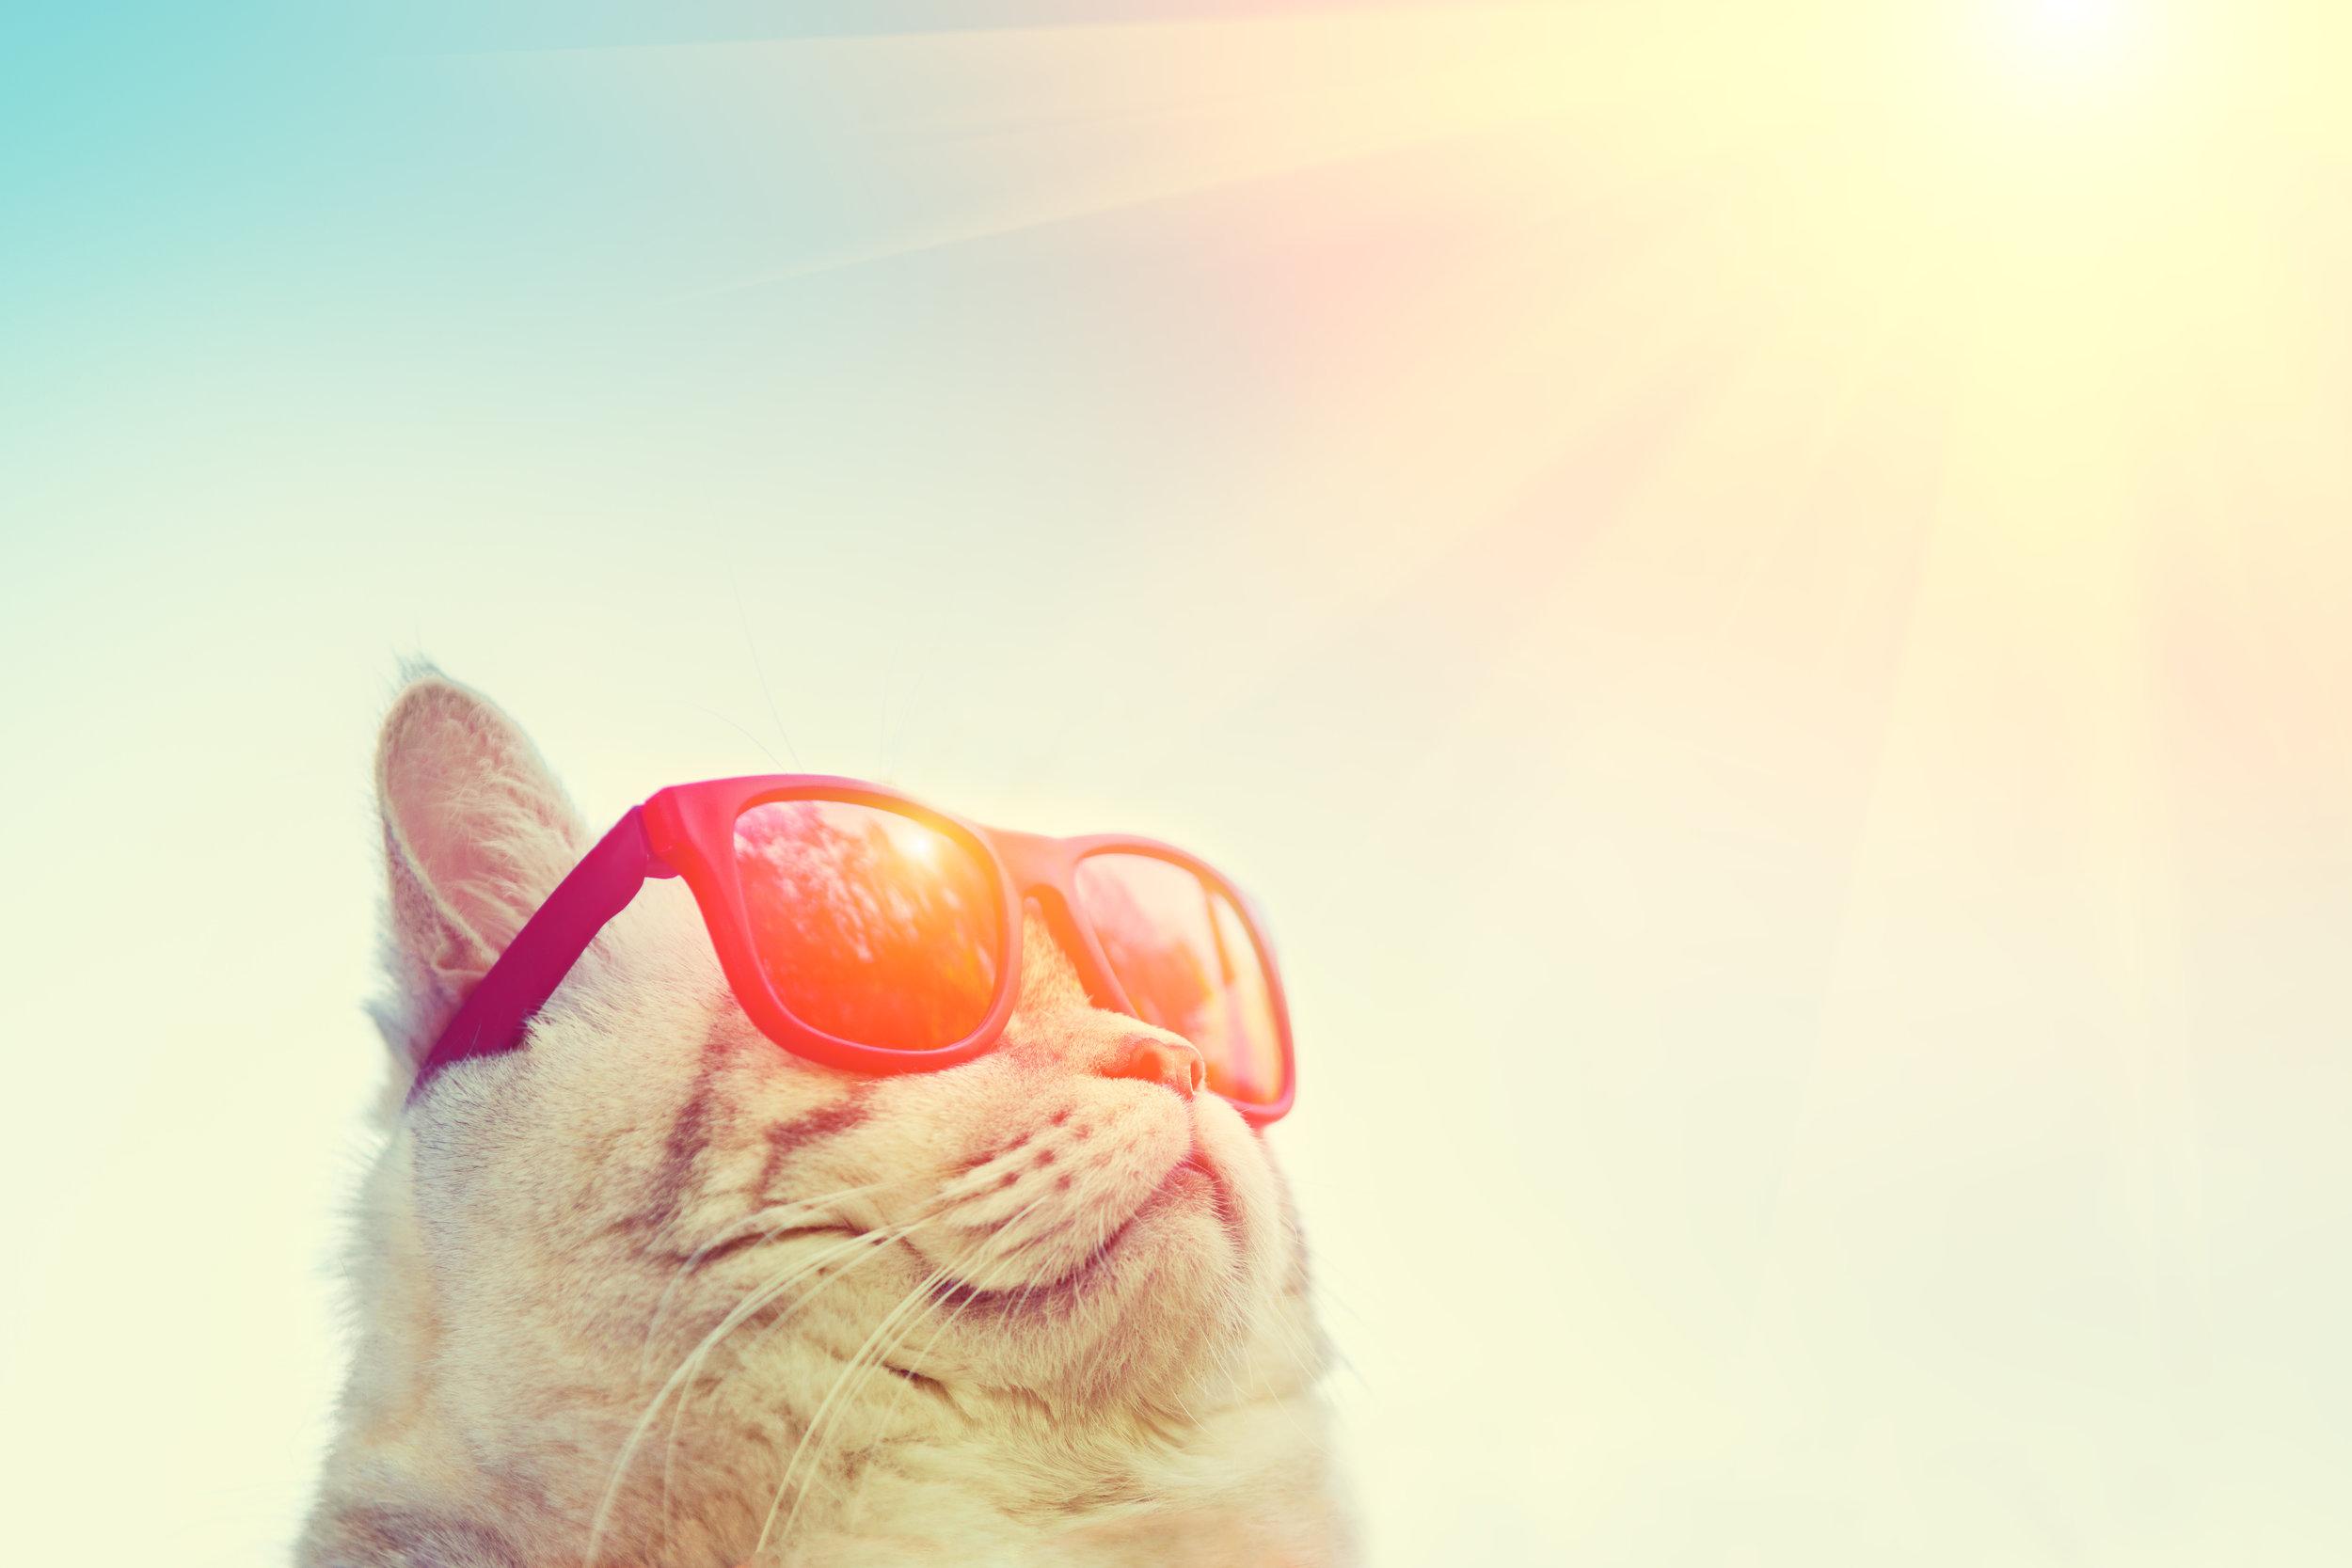 storyblocks-portrait-of-cat-wearing-sunglasses-against-sky-looking-at-the-sun_SAMXxXK1z.jpg